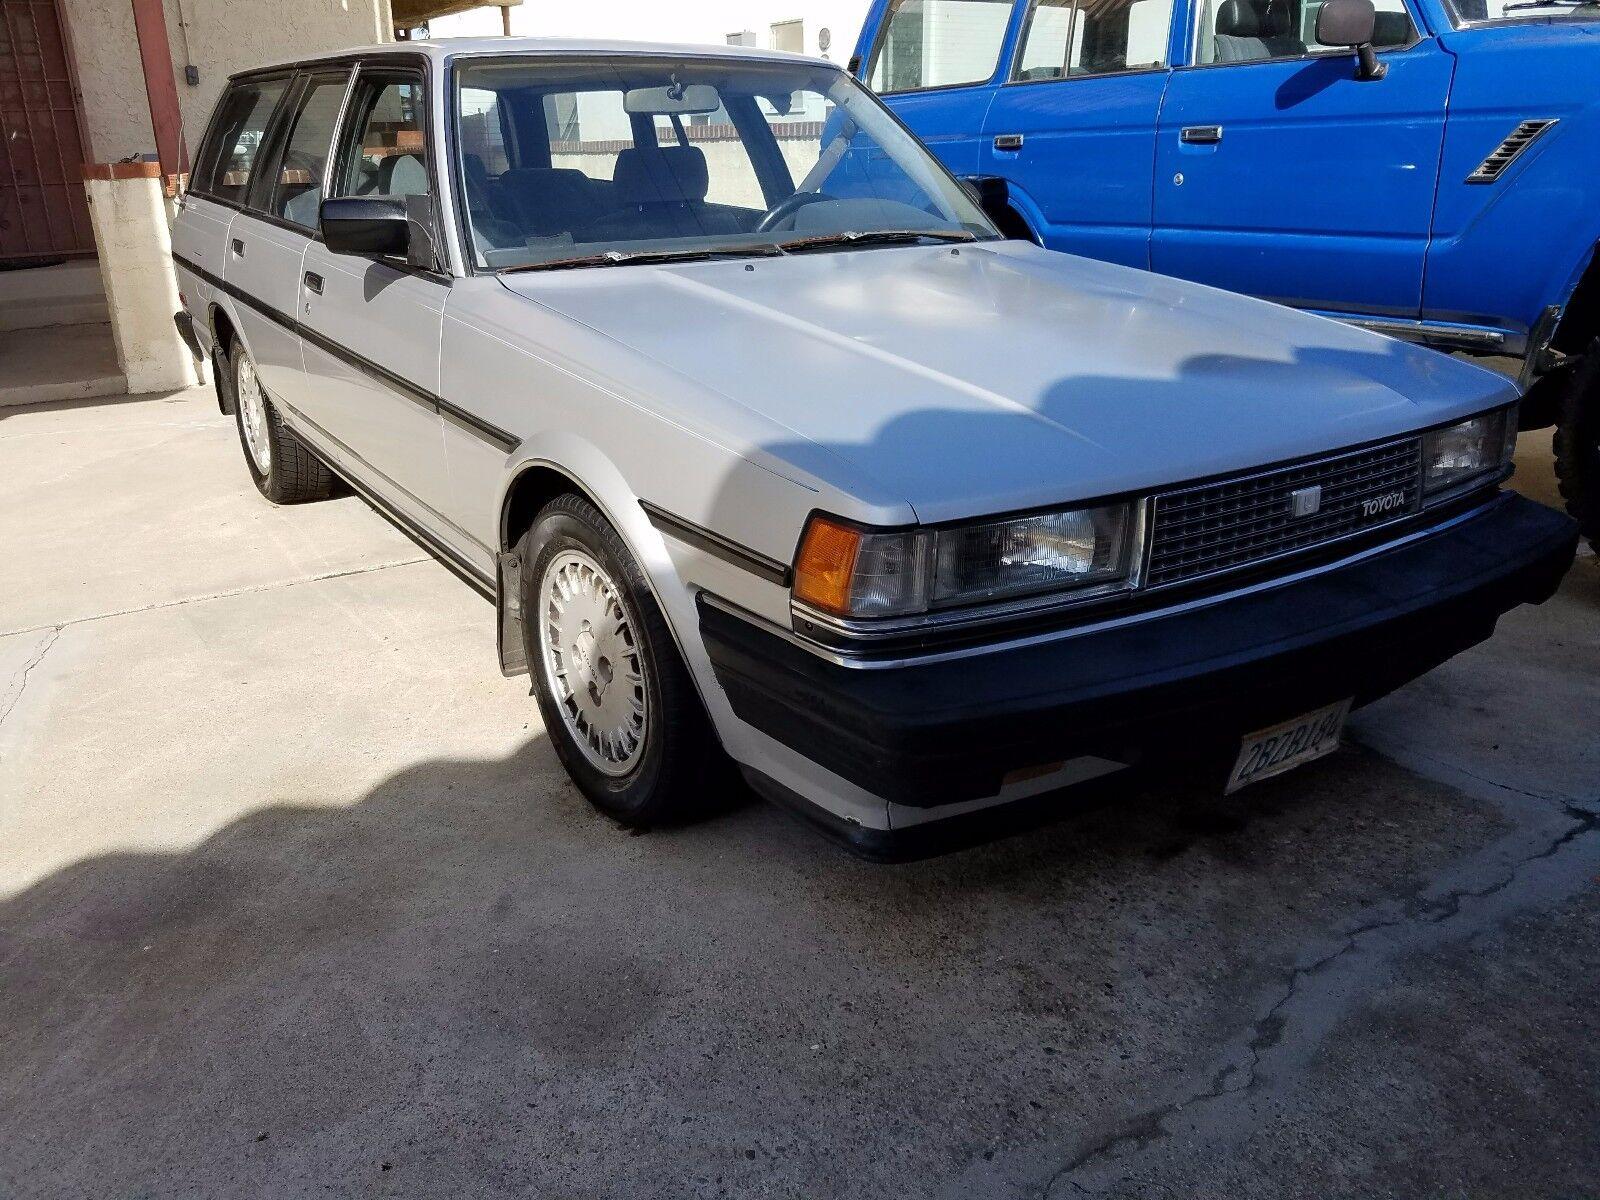 1985 Toyota Cressida Wagon Used Toyota Cressida for sale